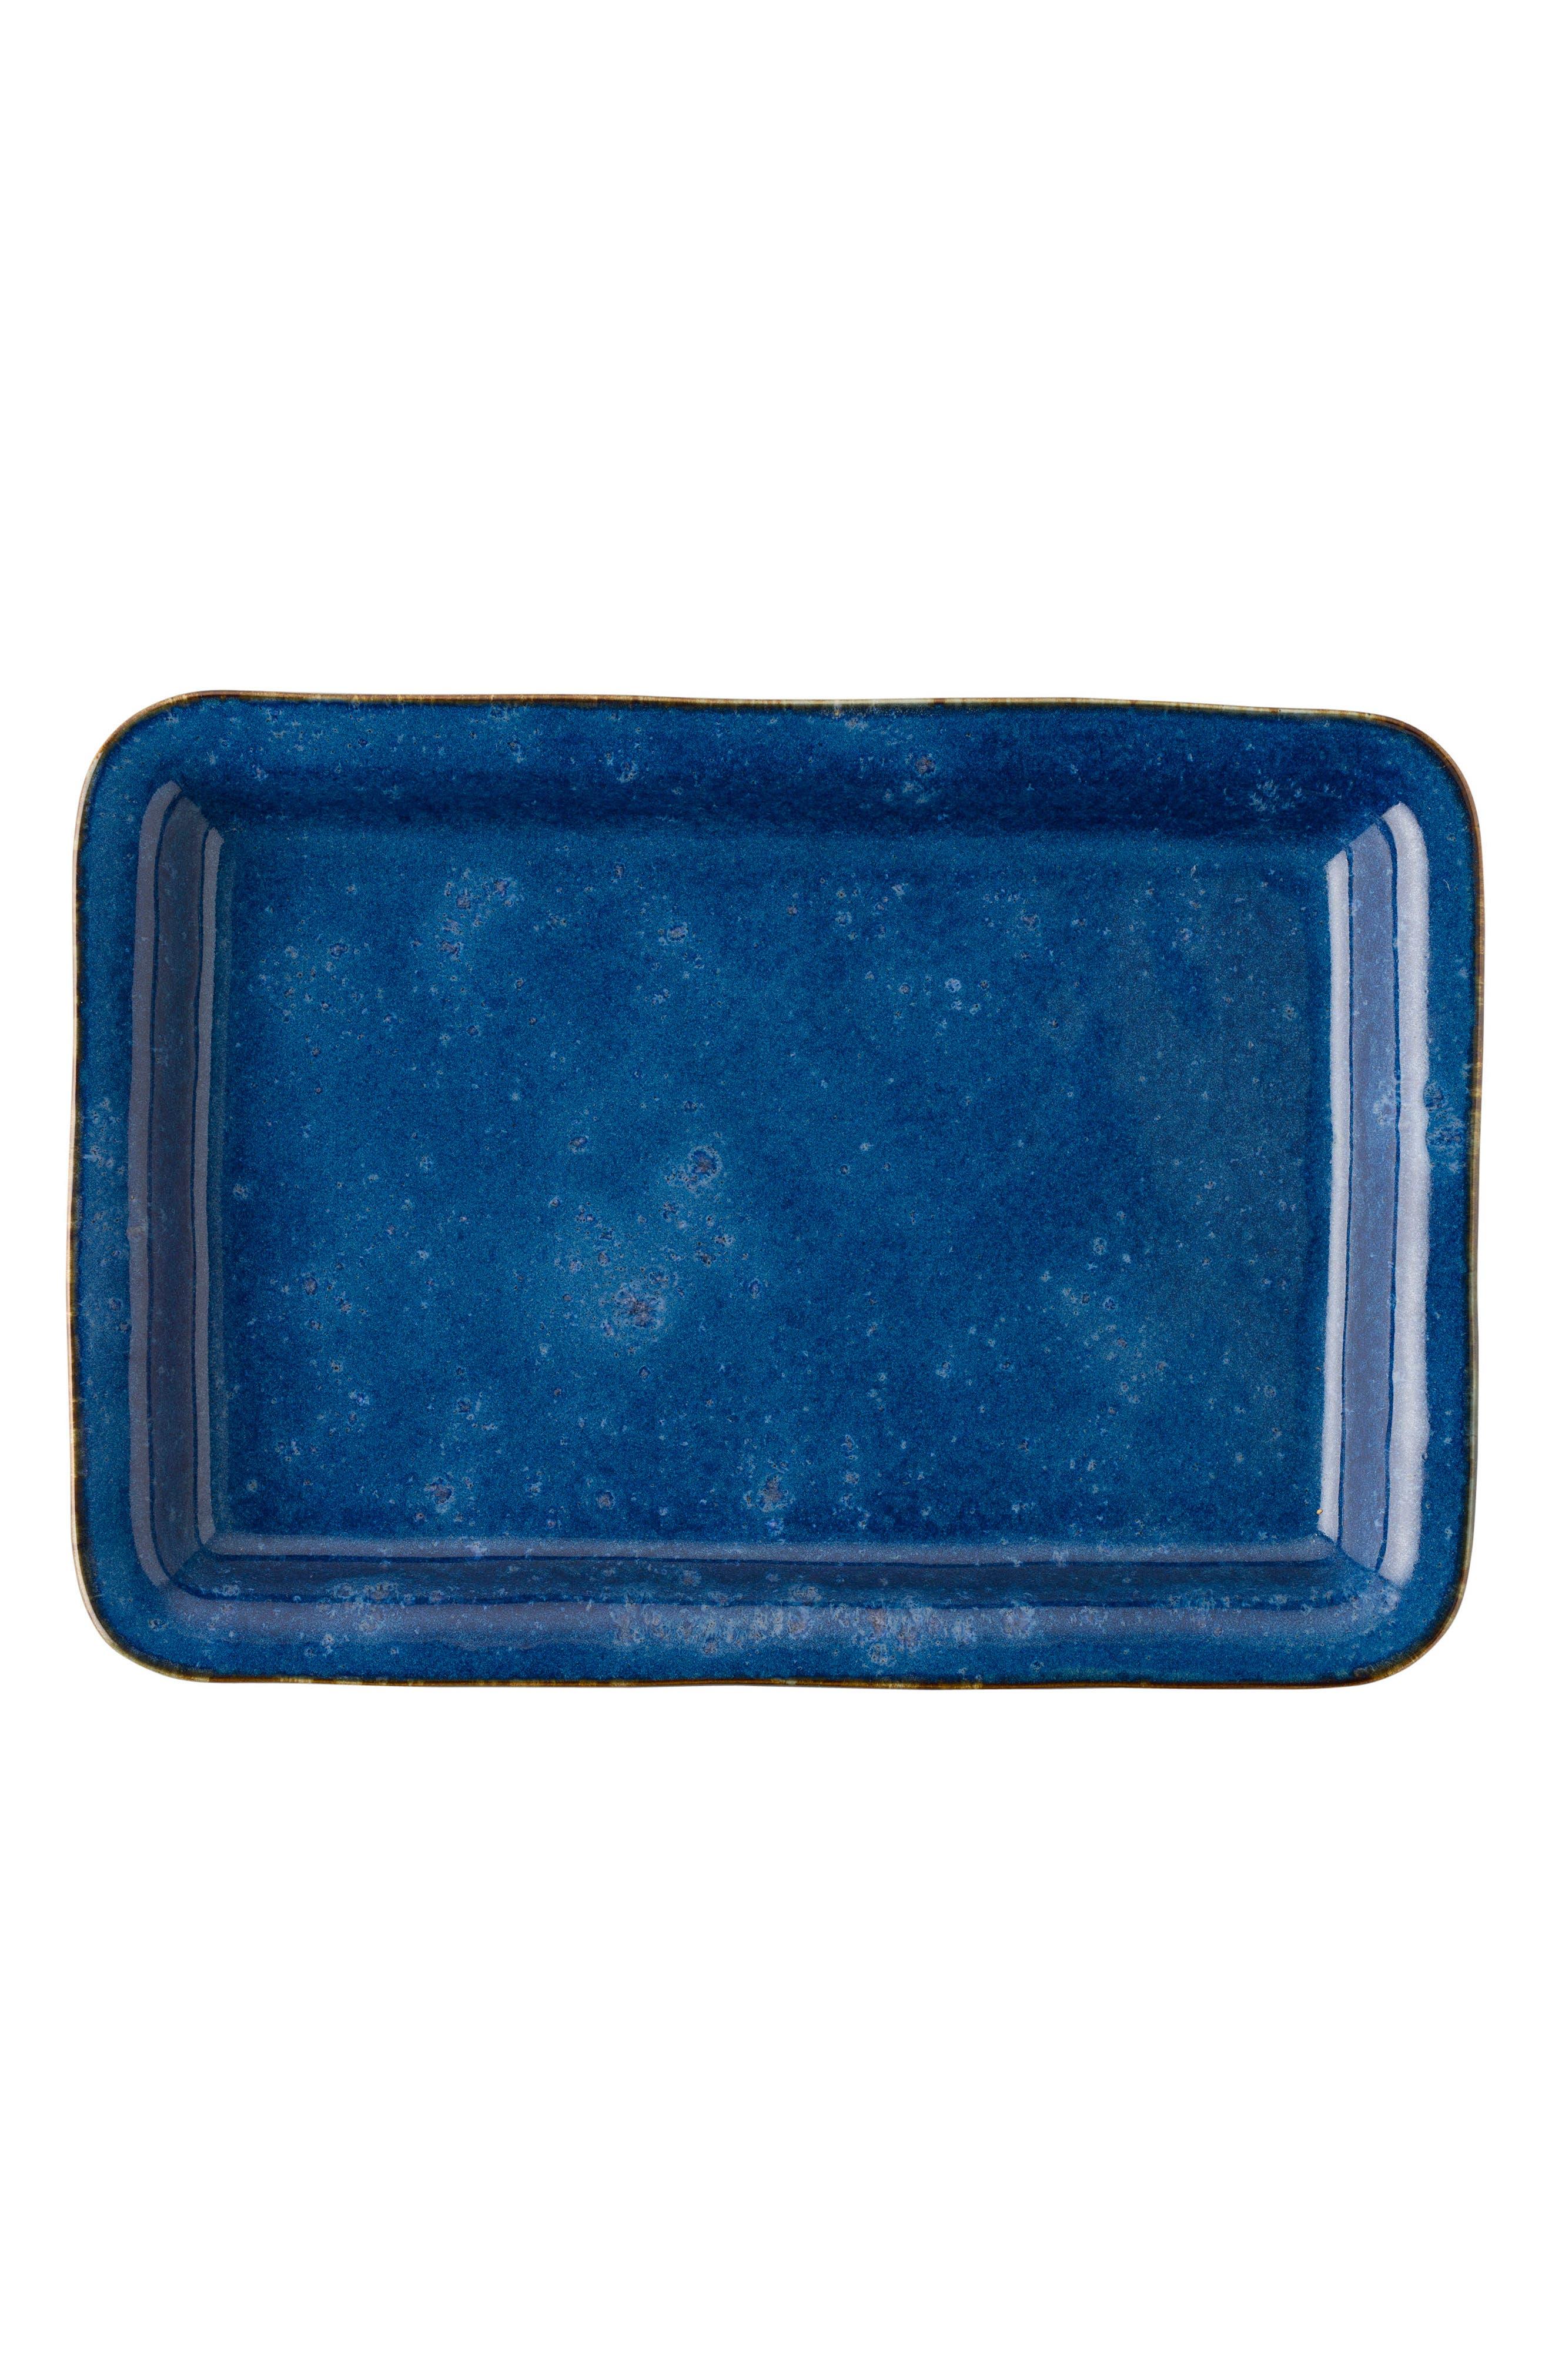 Puro Rectangular Ceramic Serving Tray,                             Alternate thumbnail 2, color,                             Dappled Cobalt